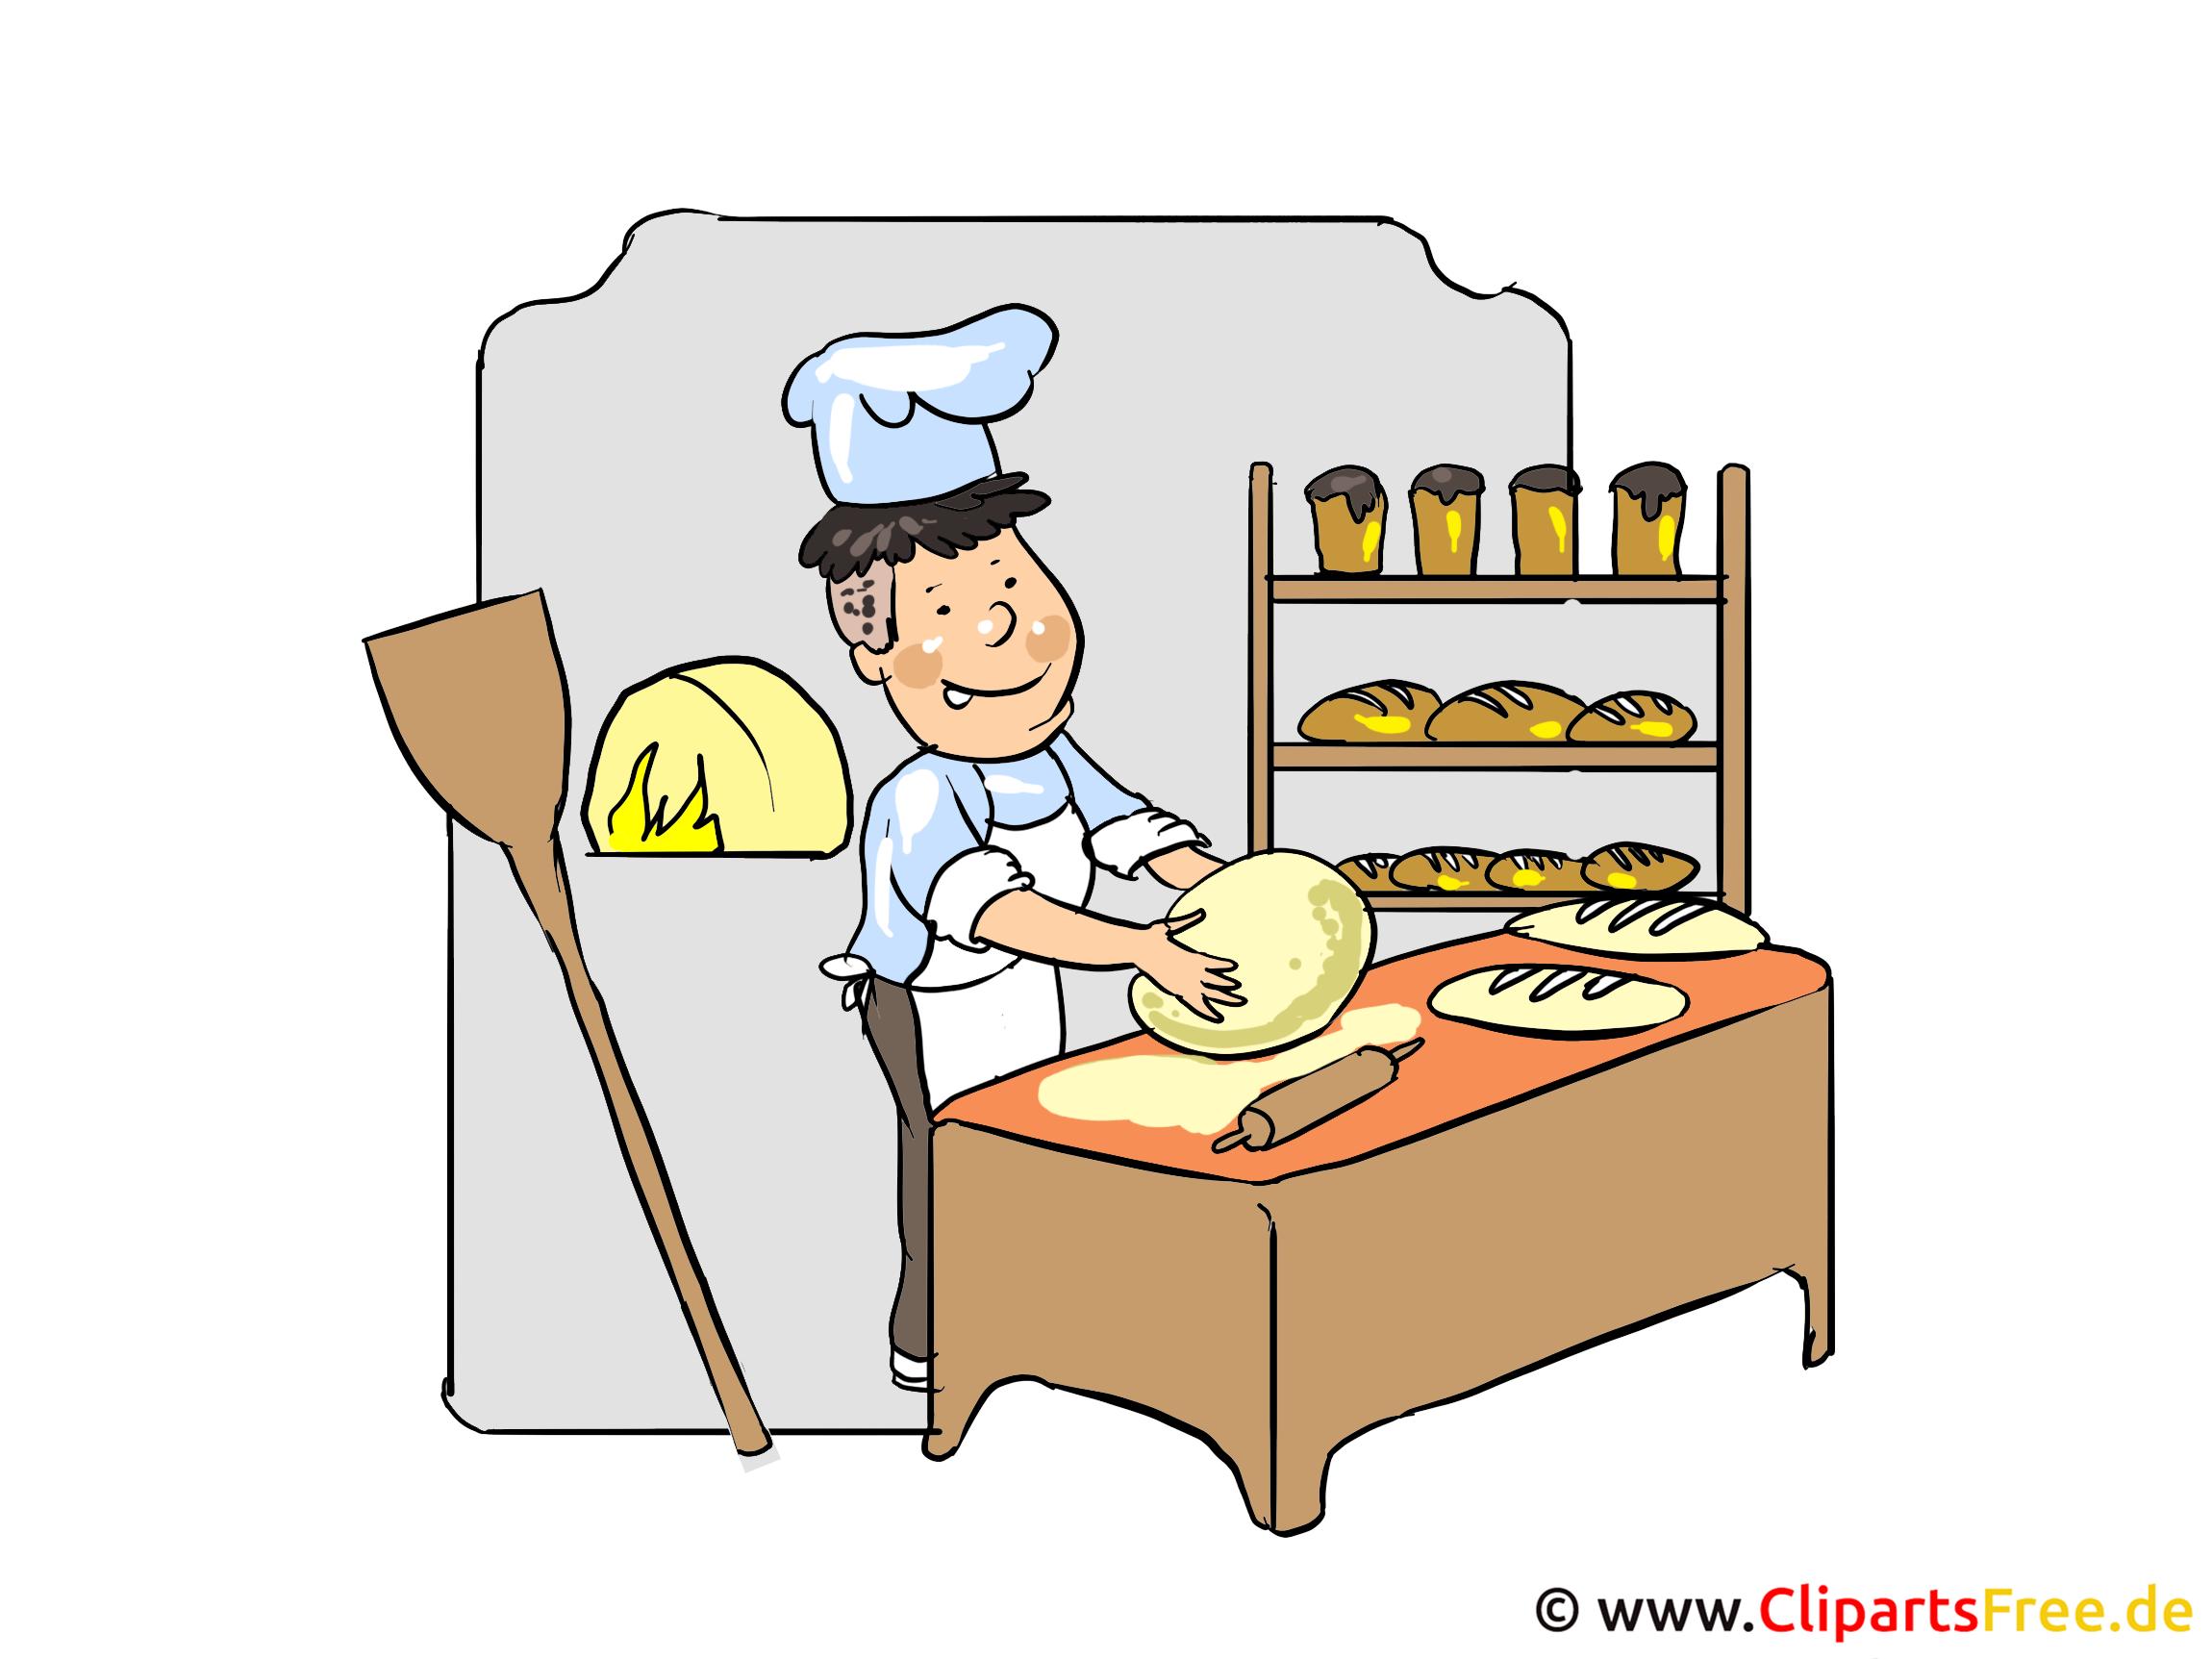 Baecker Clipart, Bild, Cartoon, Illustration kostenlos